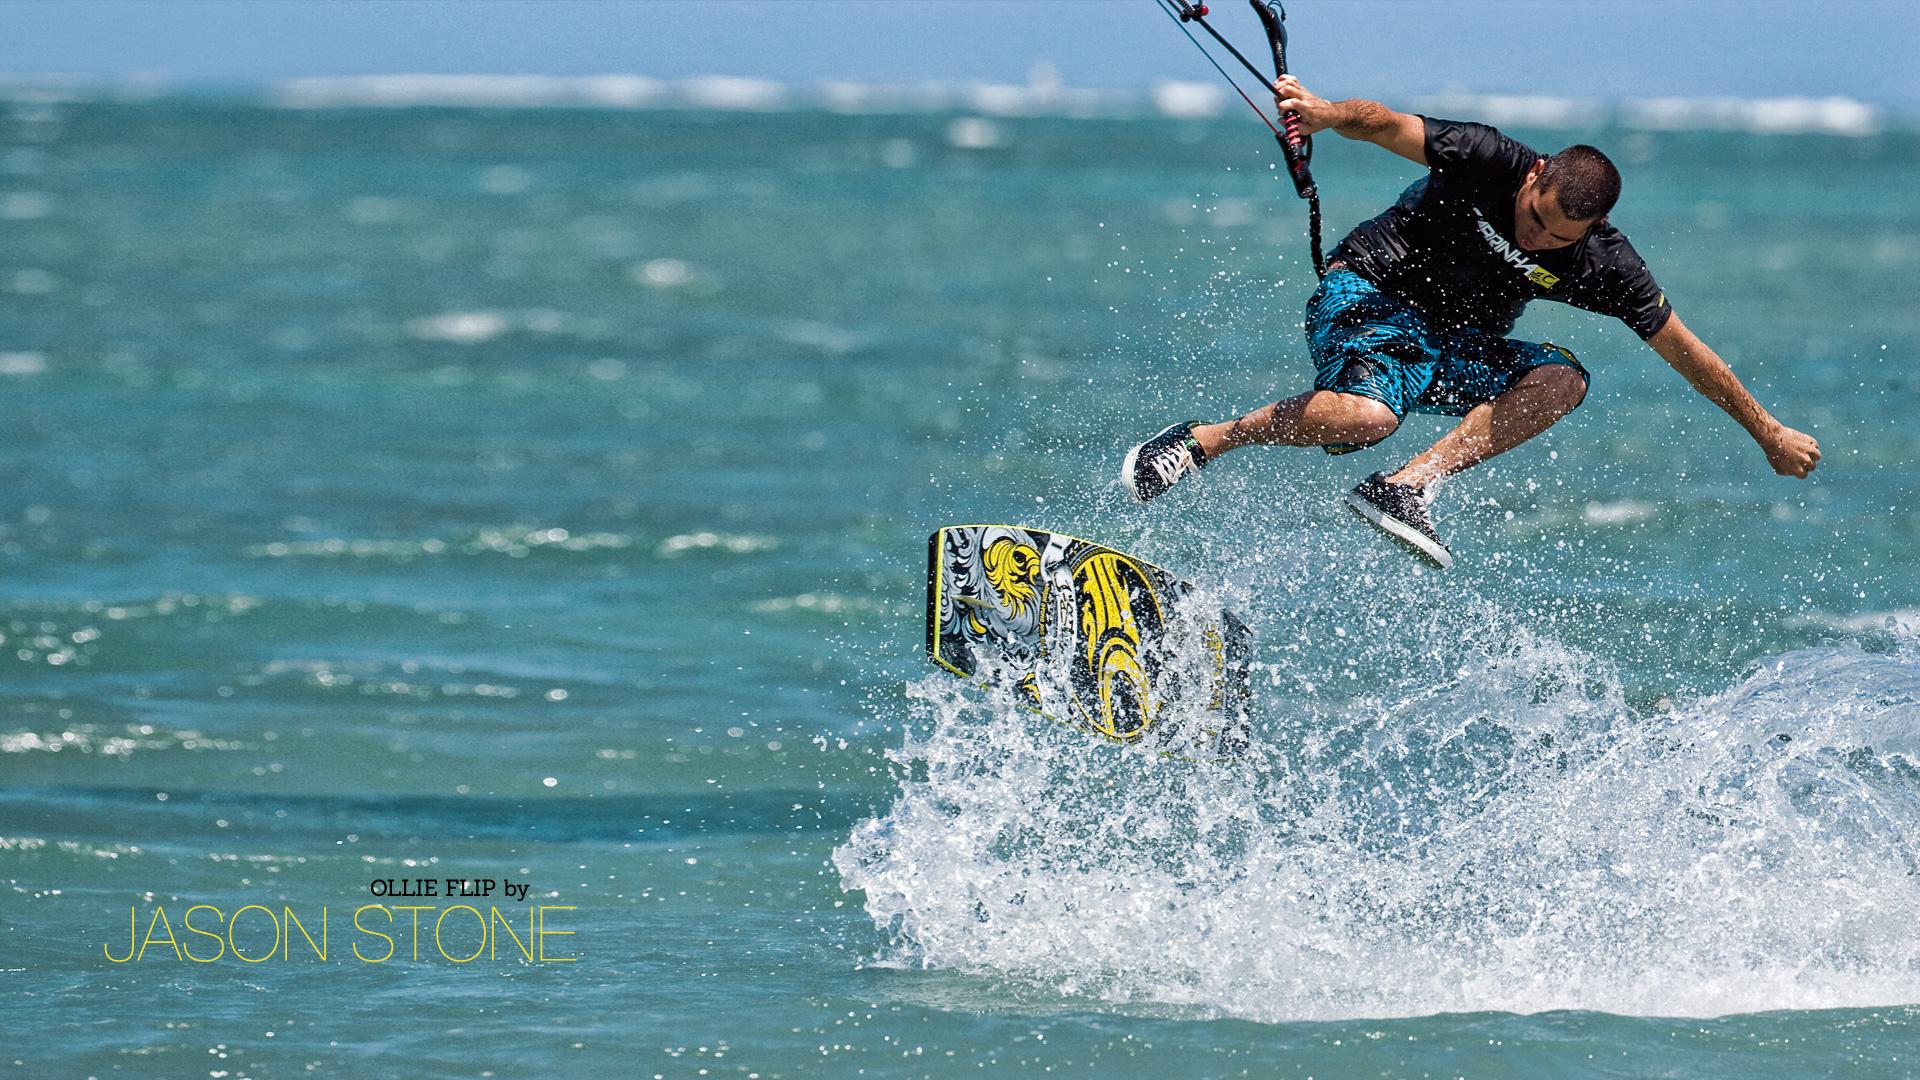 kitesurf wallpaper image - Jason on the wake skate - in resolution: High Definition - HD 16:9 1920 X 1080